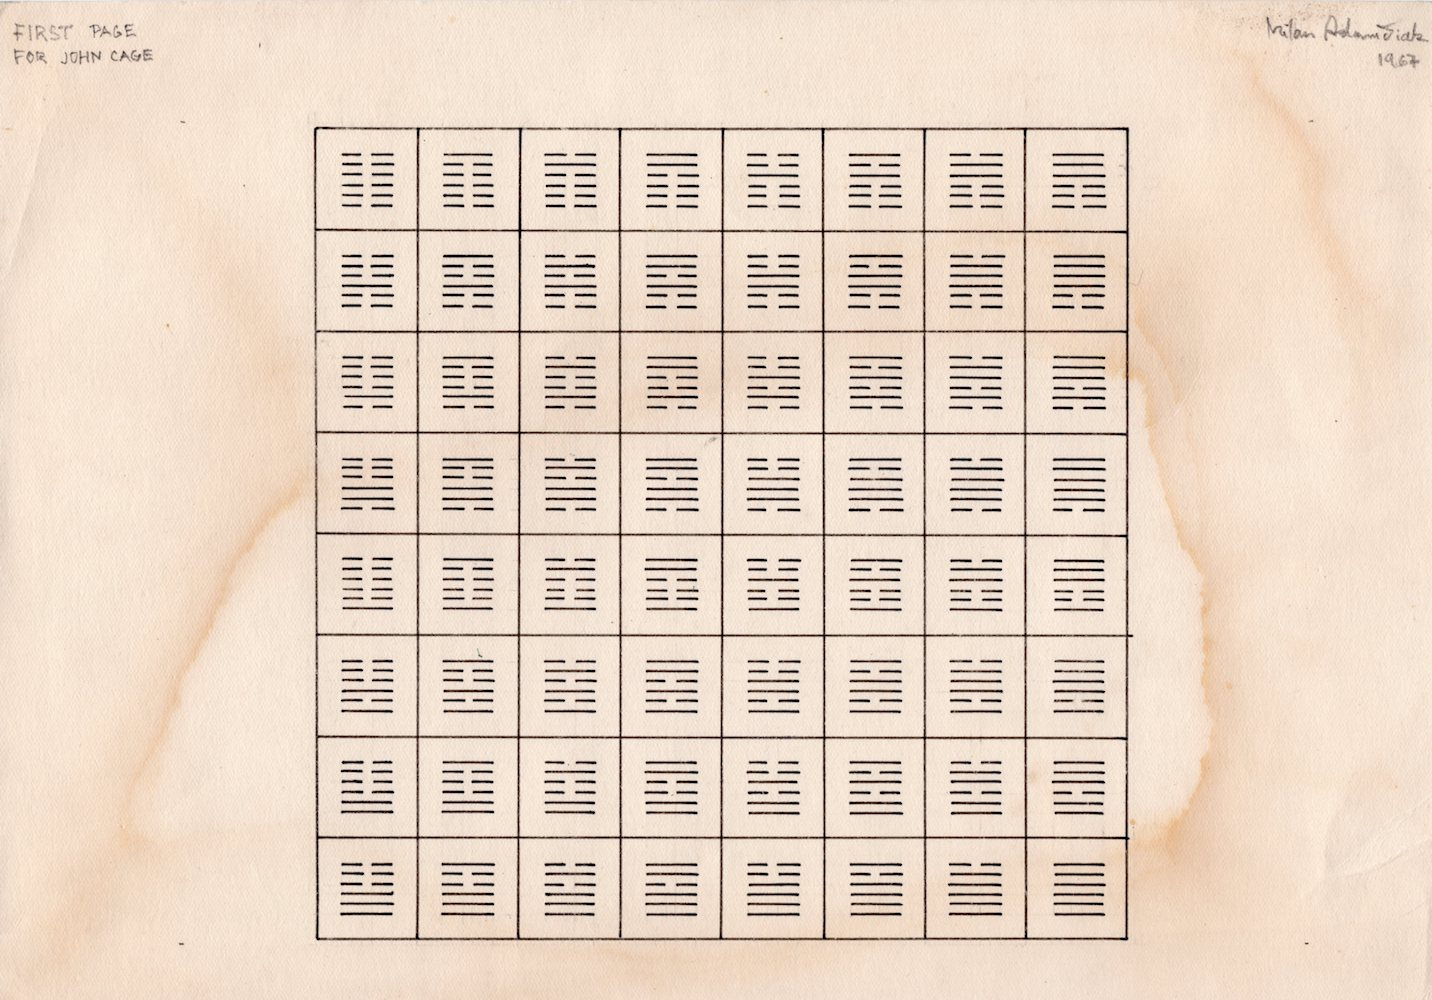 1967, First Page For John Cage, kresba na papieri, 21x29,5 cm